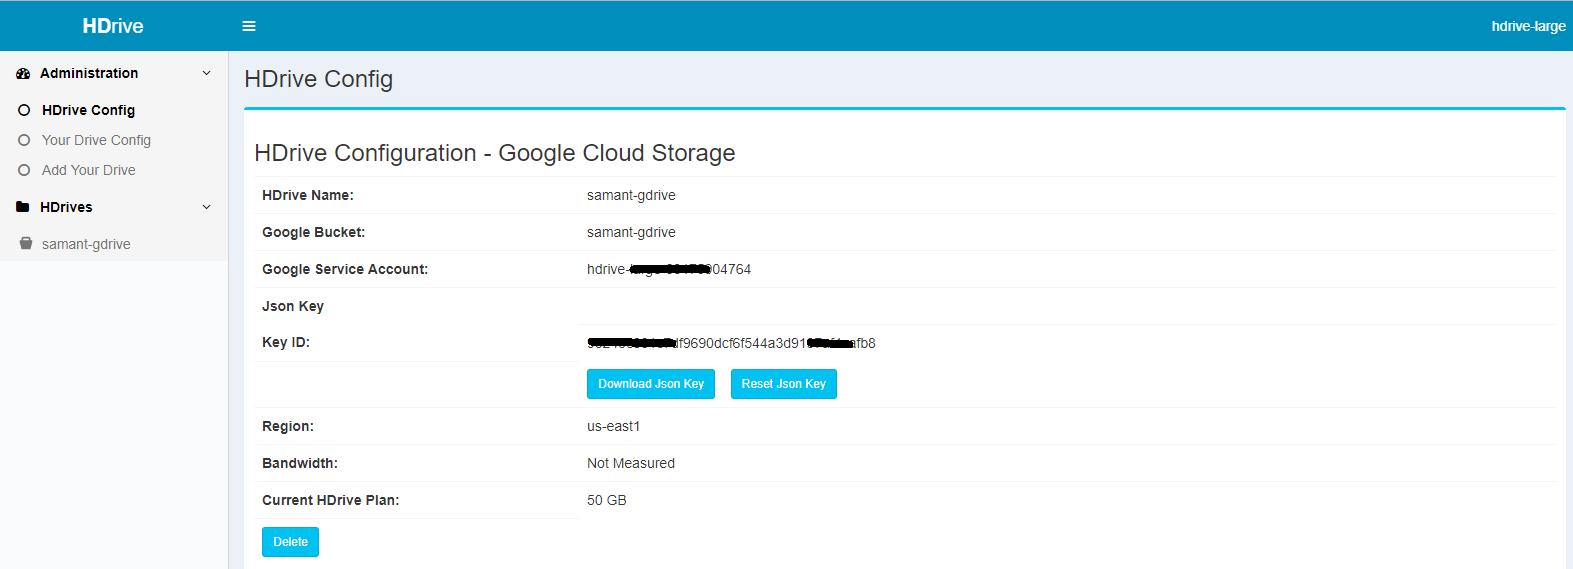 Google HDrive Config